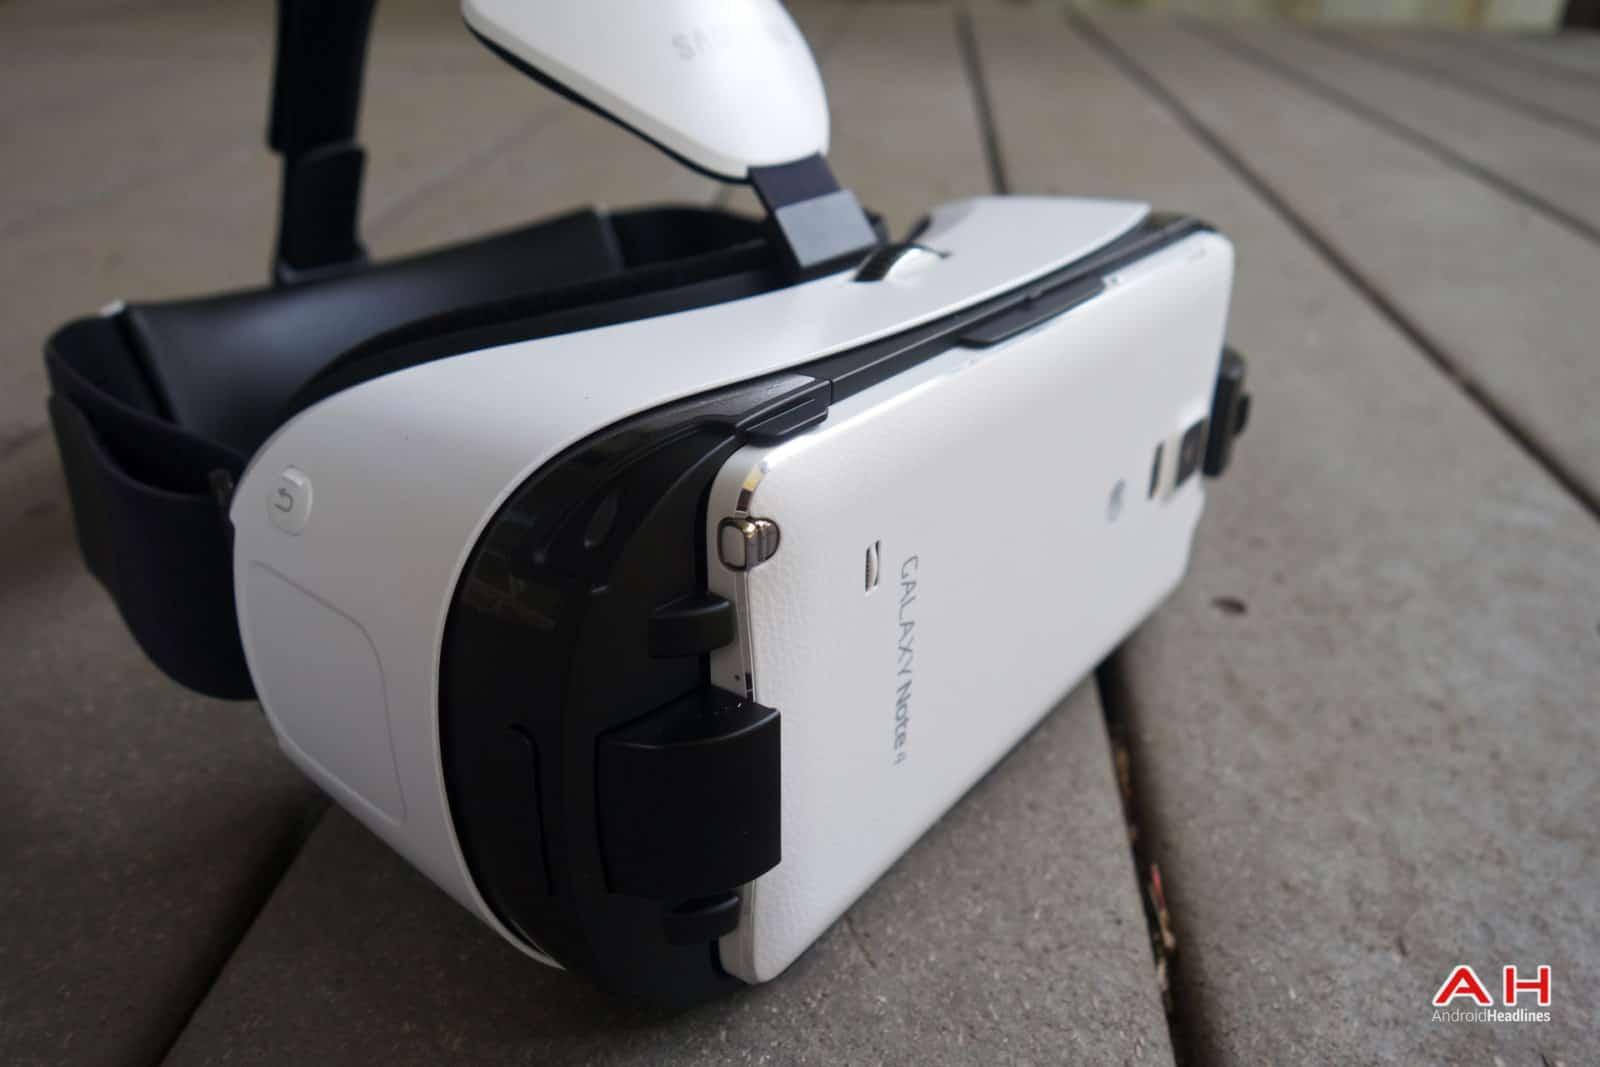 AH Samsung Gear VR-13